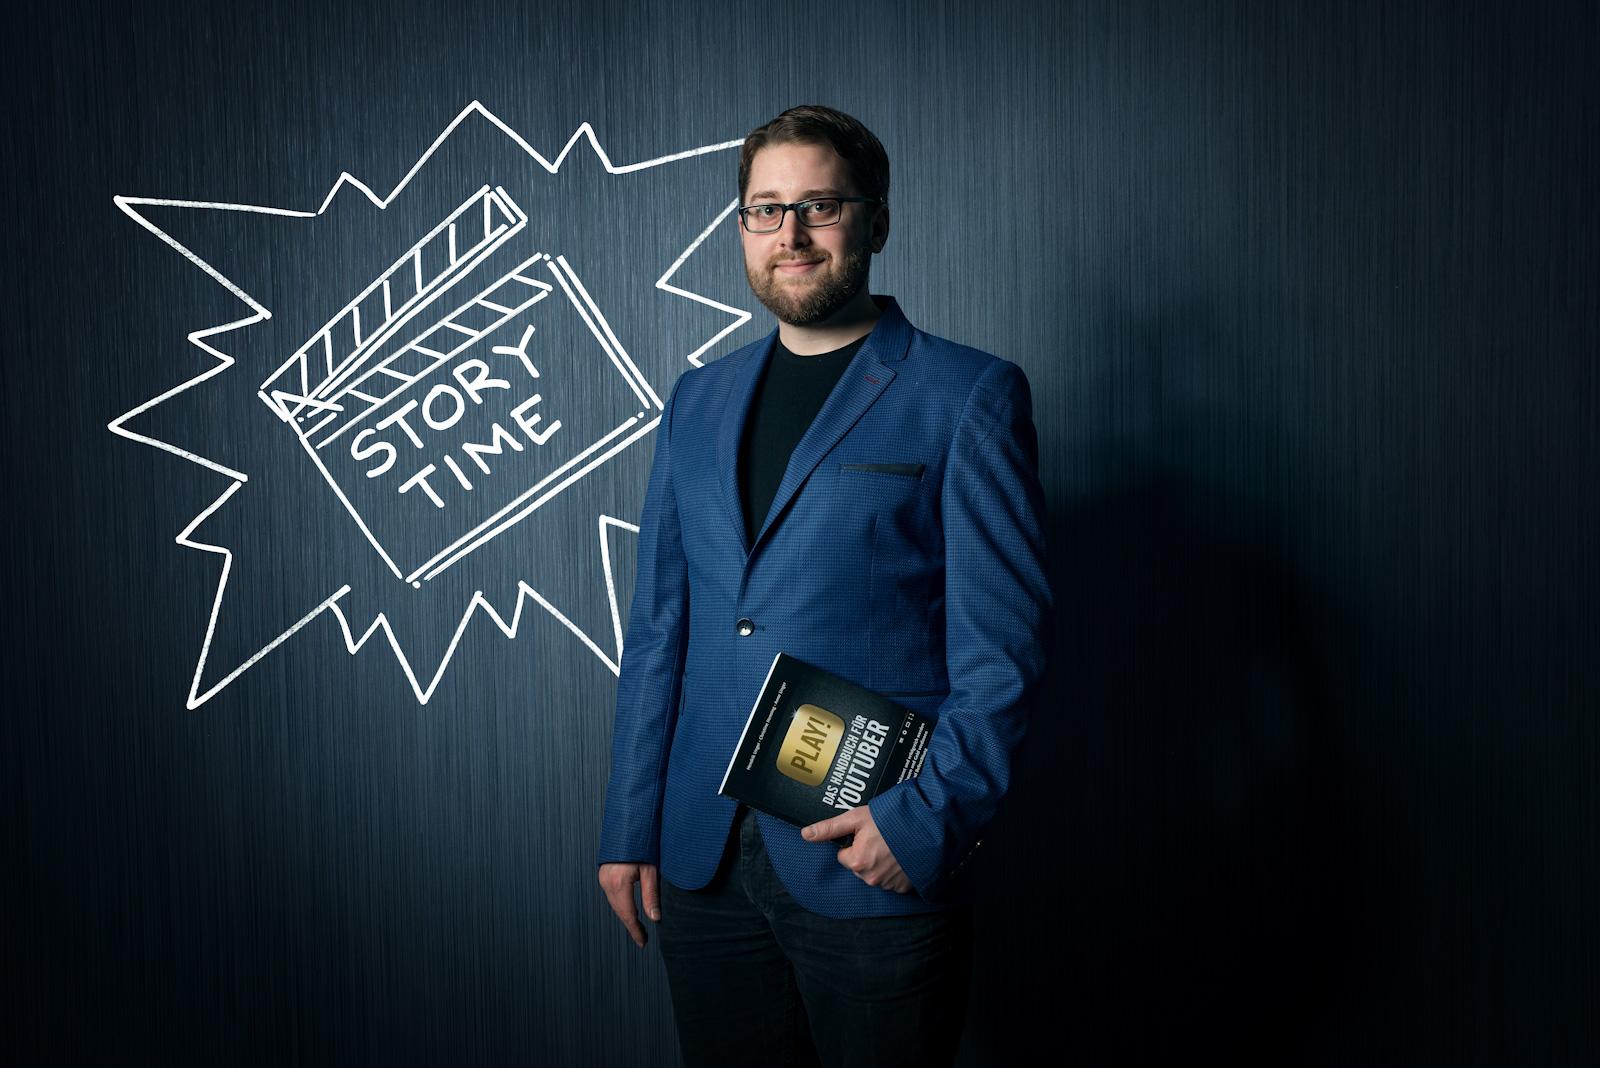 Tobias Ahrens Kameramann Online Redakteur